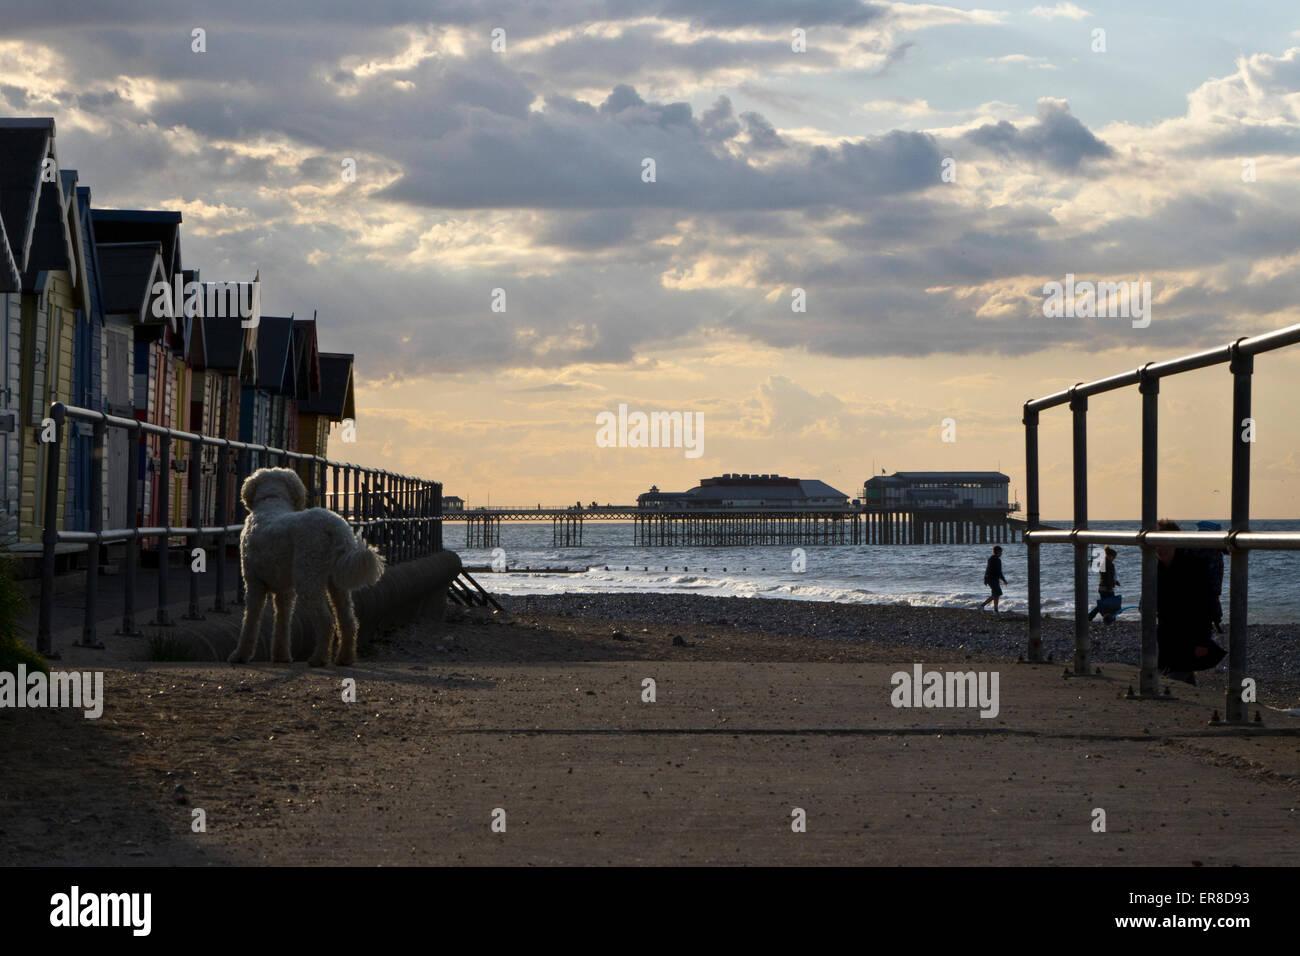 dog-on-seafront-beach-ER8D93.jpg